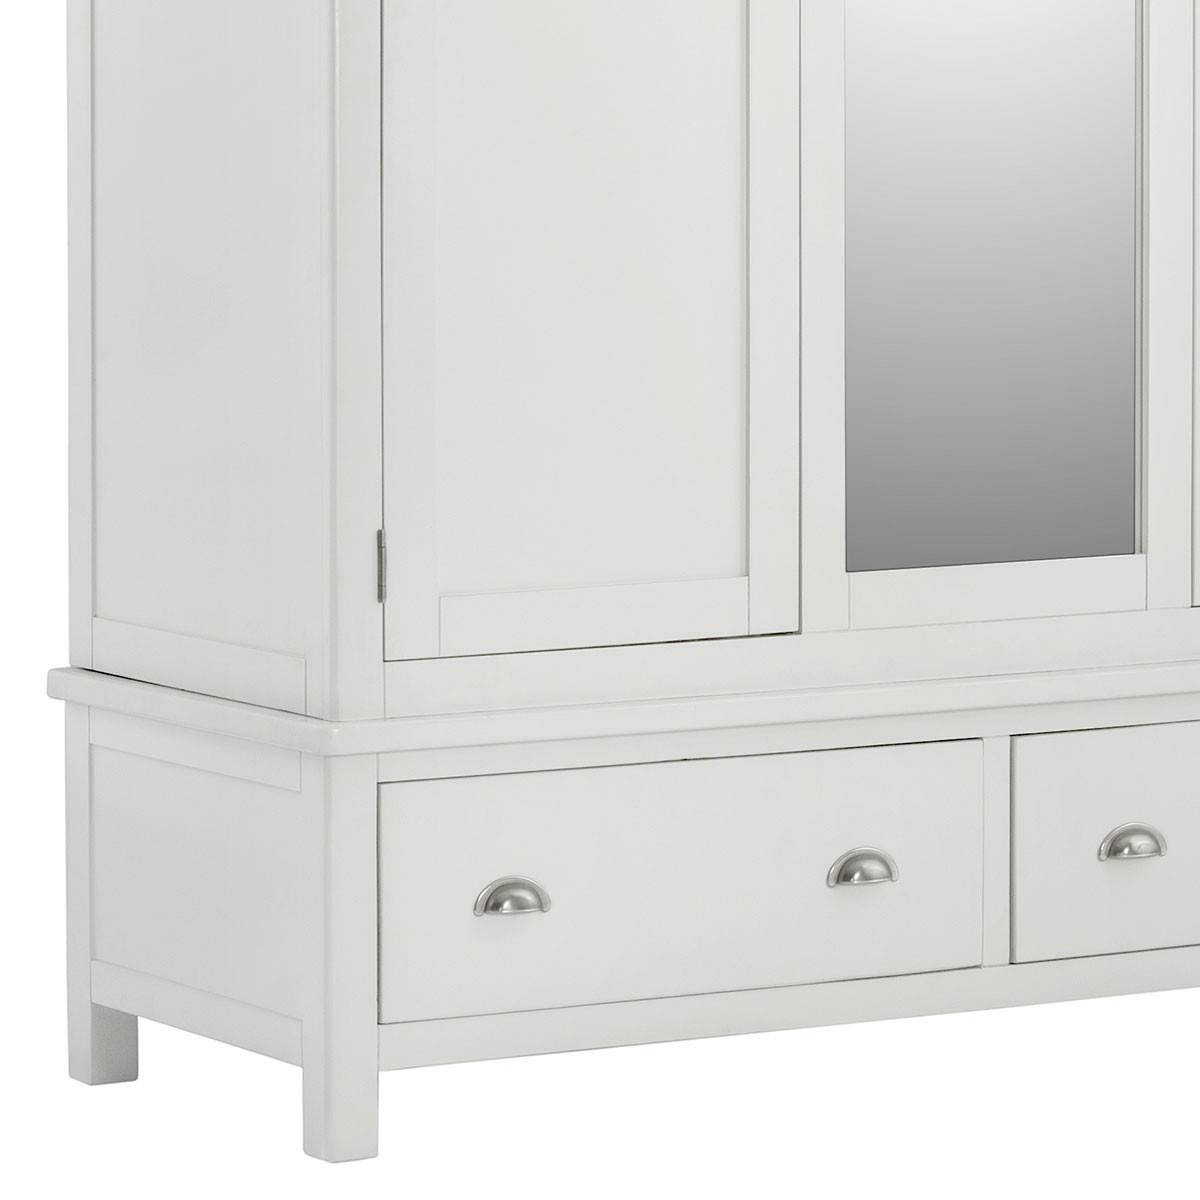 Wardrobe With Mirror. Click To Zoom Inout. 6 Door Wardrobe With within Triple Mirrored Wardrobes (Image 10 of 15)